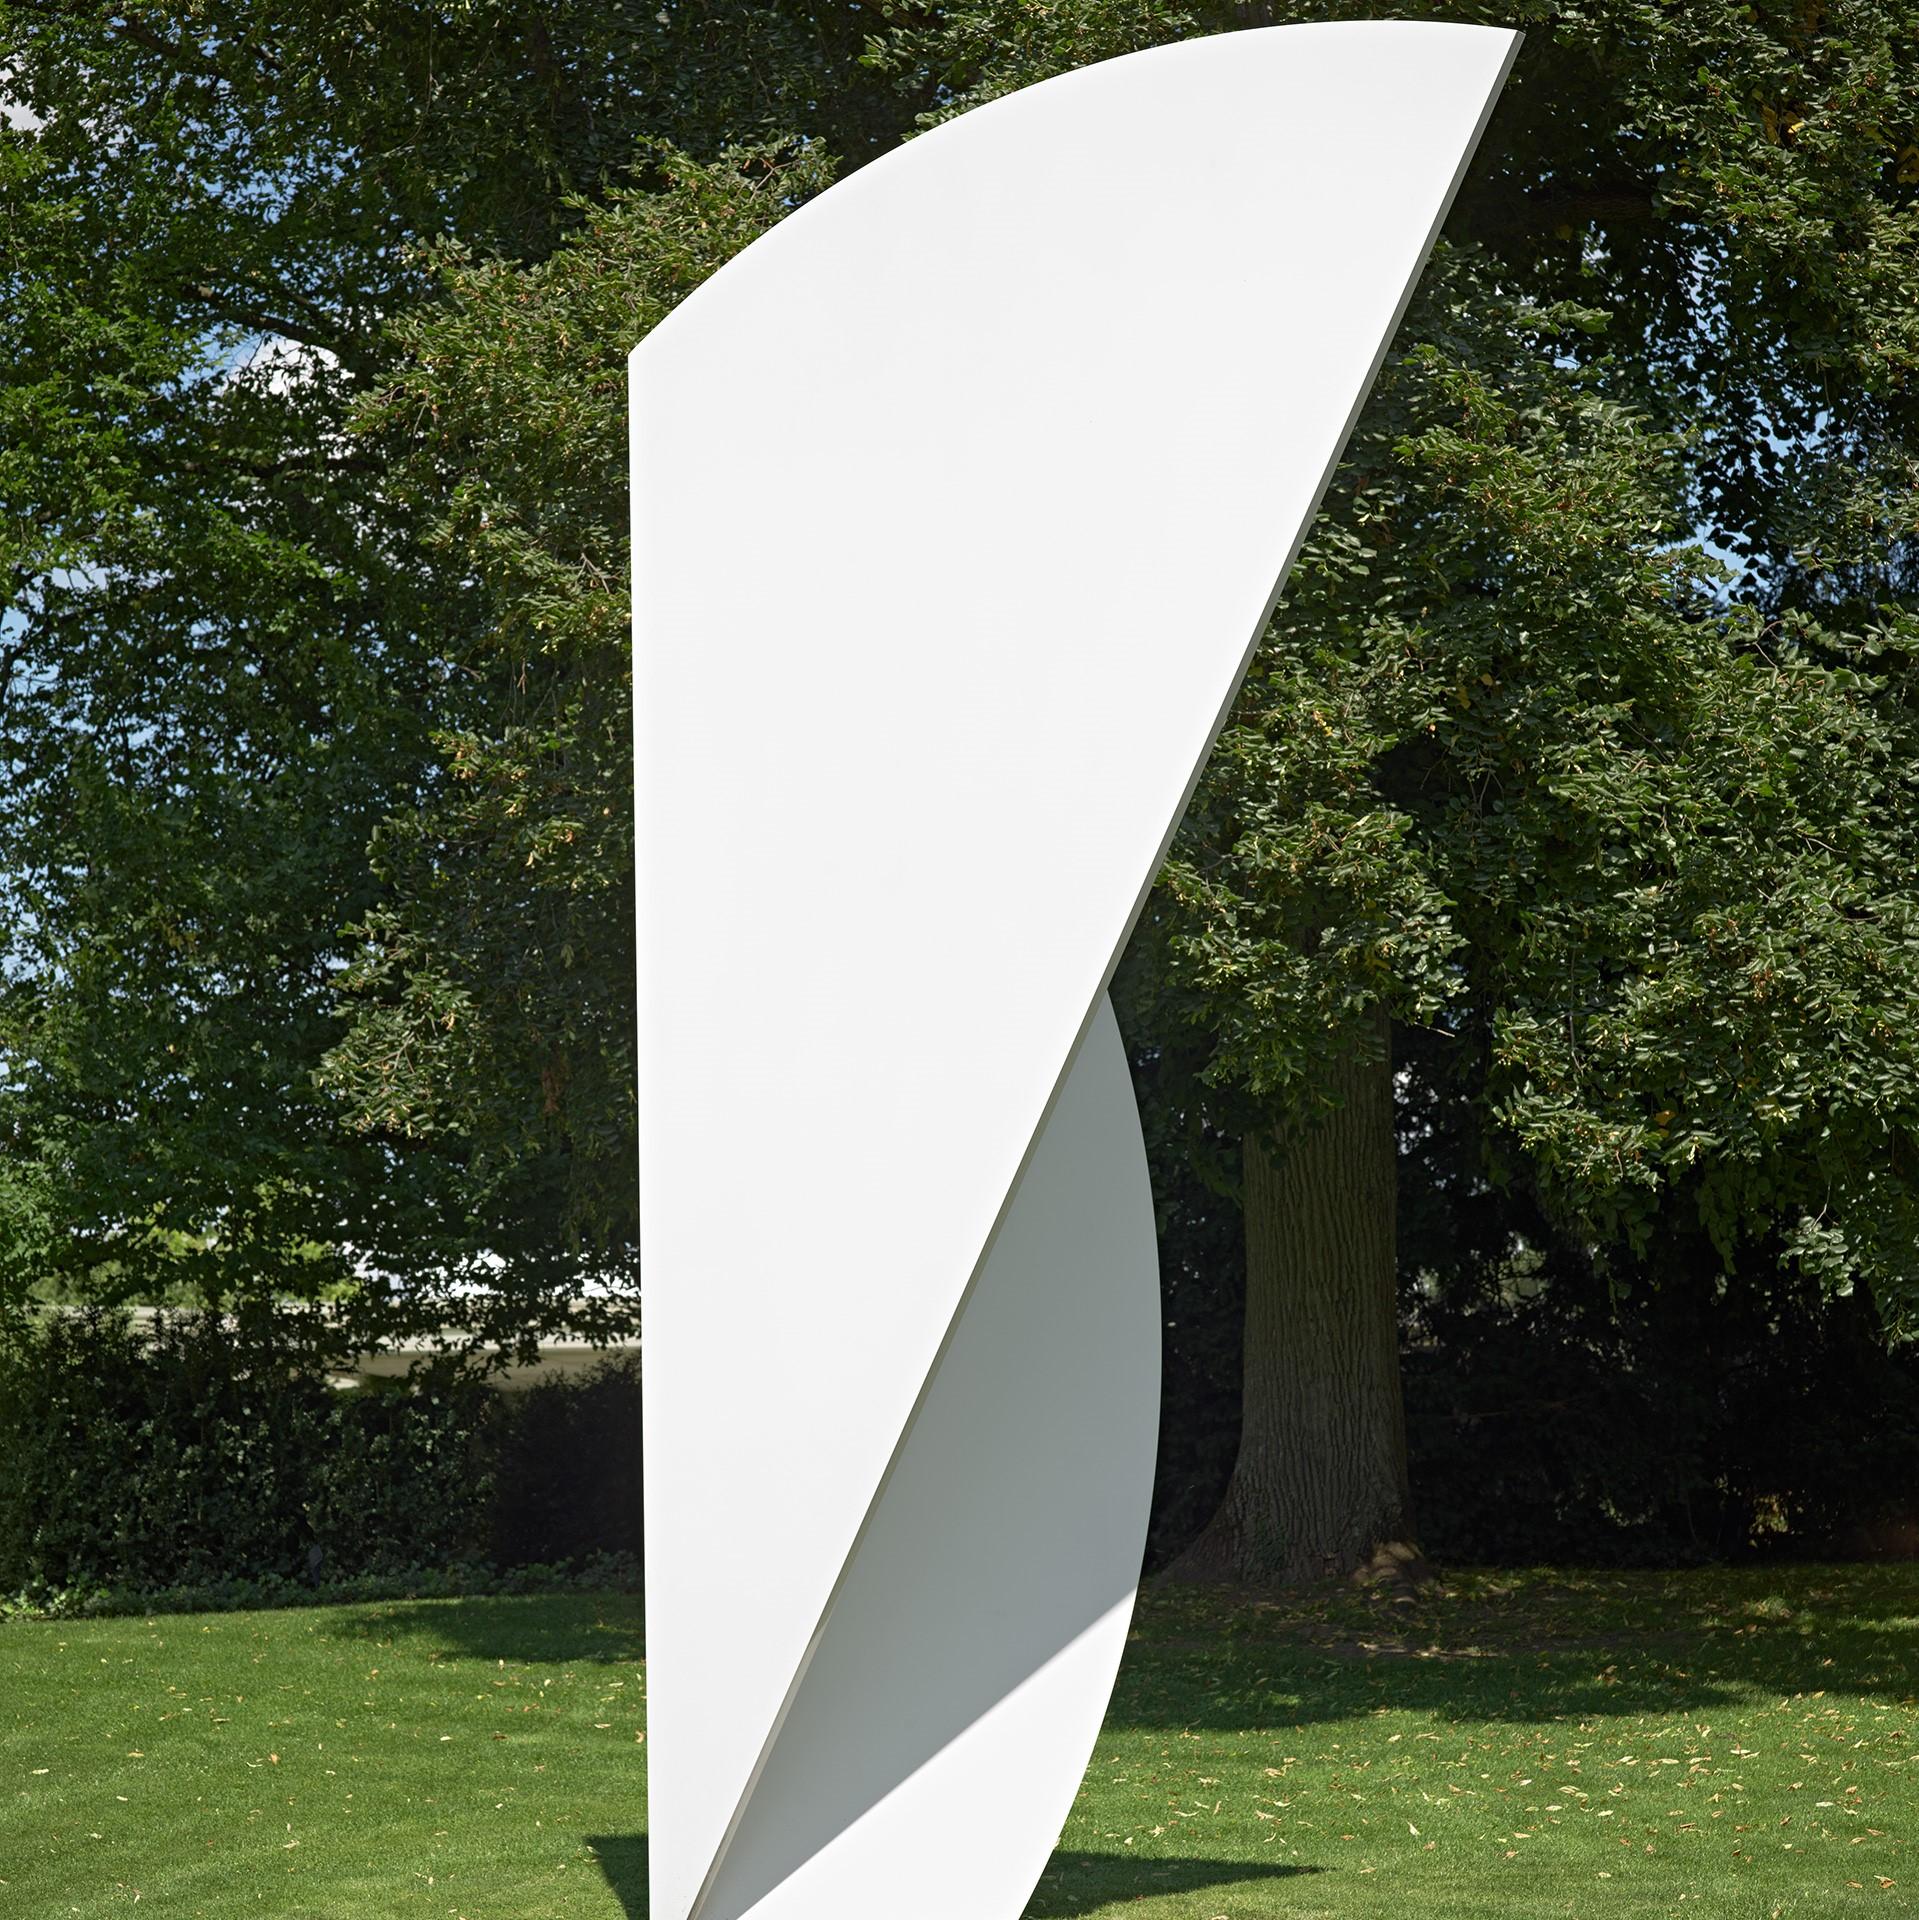 32-kelly_white-curves-2001_inv-01-2_46509.jpg